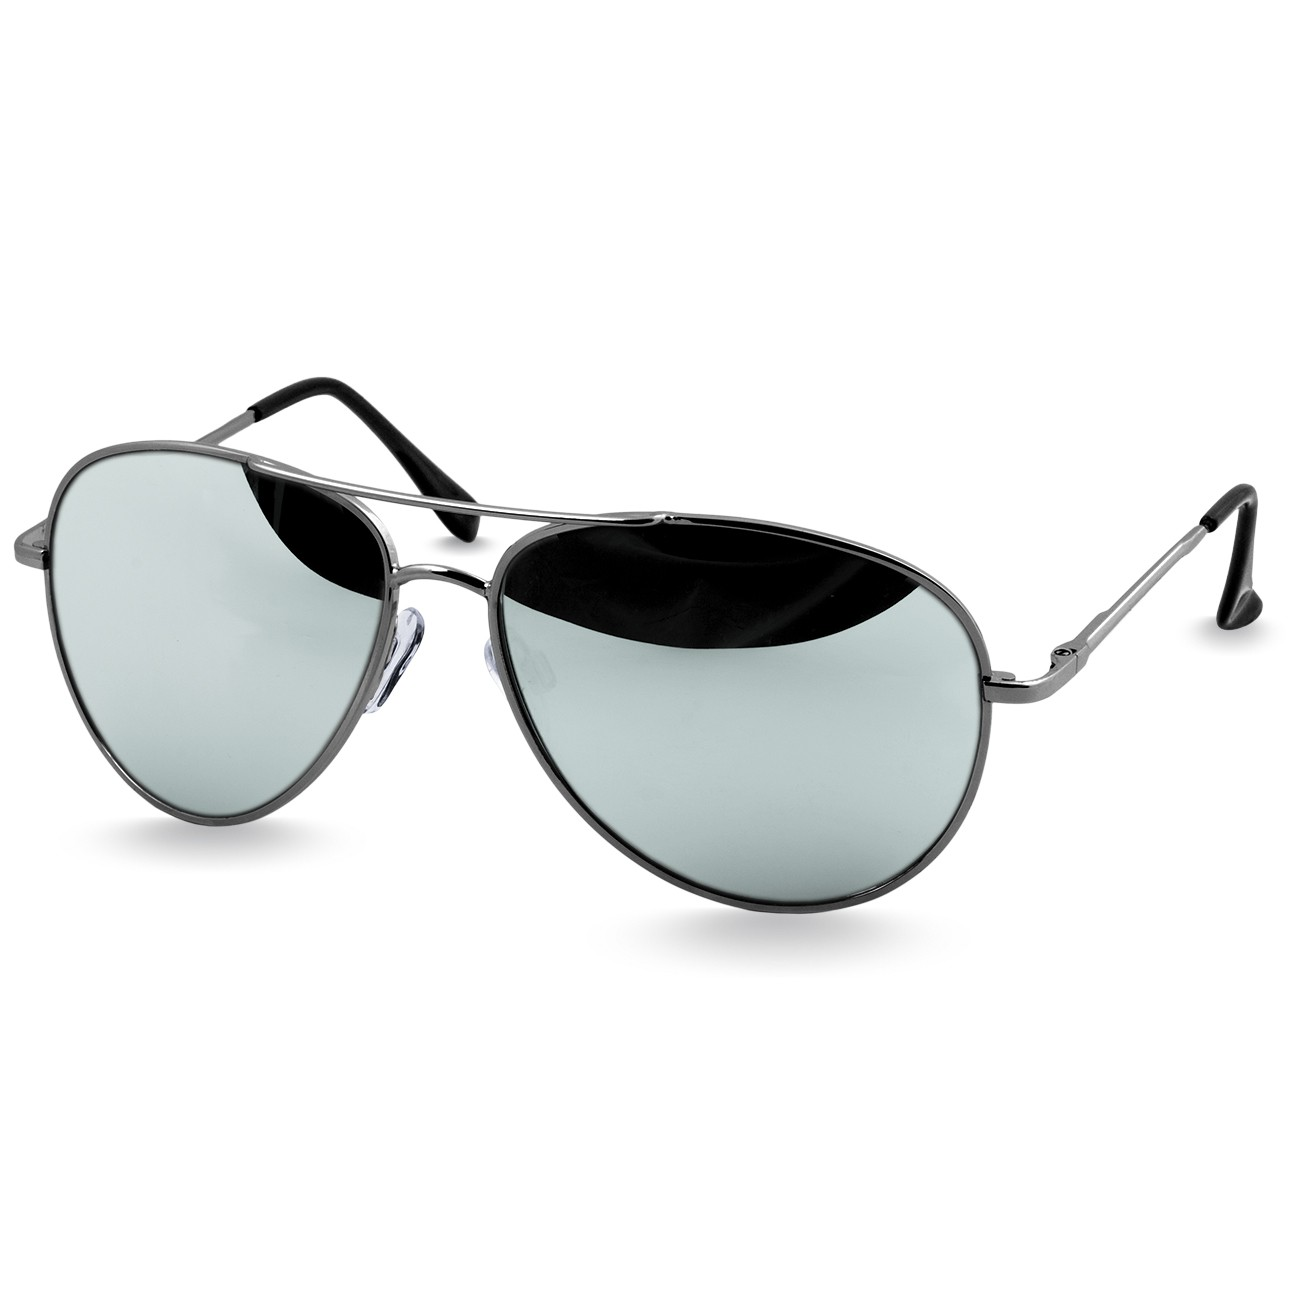 caspar damen herren aviator sonnenbrille pilotenbrille. Black Bedroom Furniture Sets. Home Design Ideas